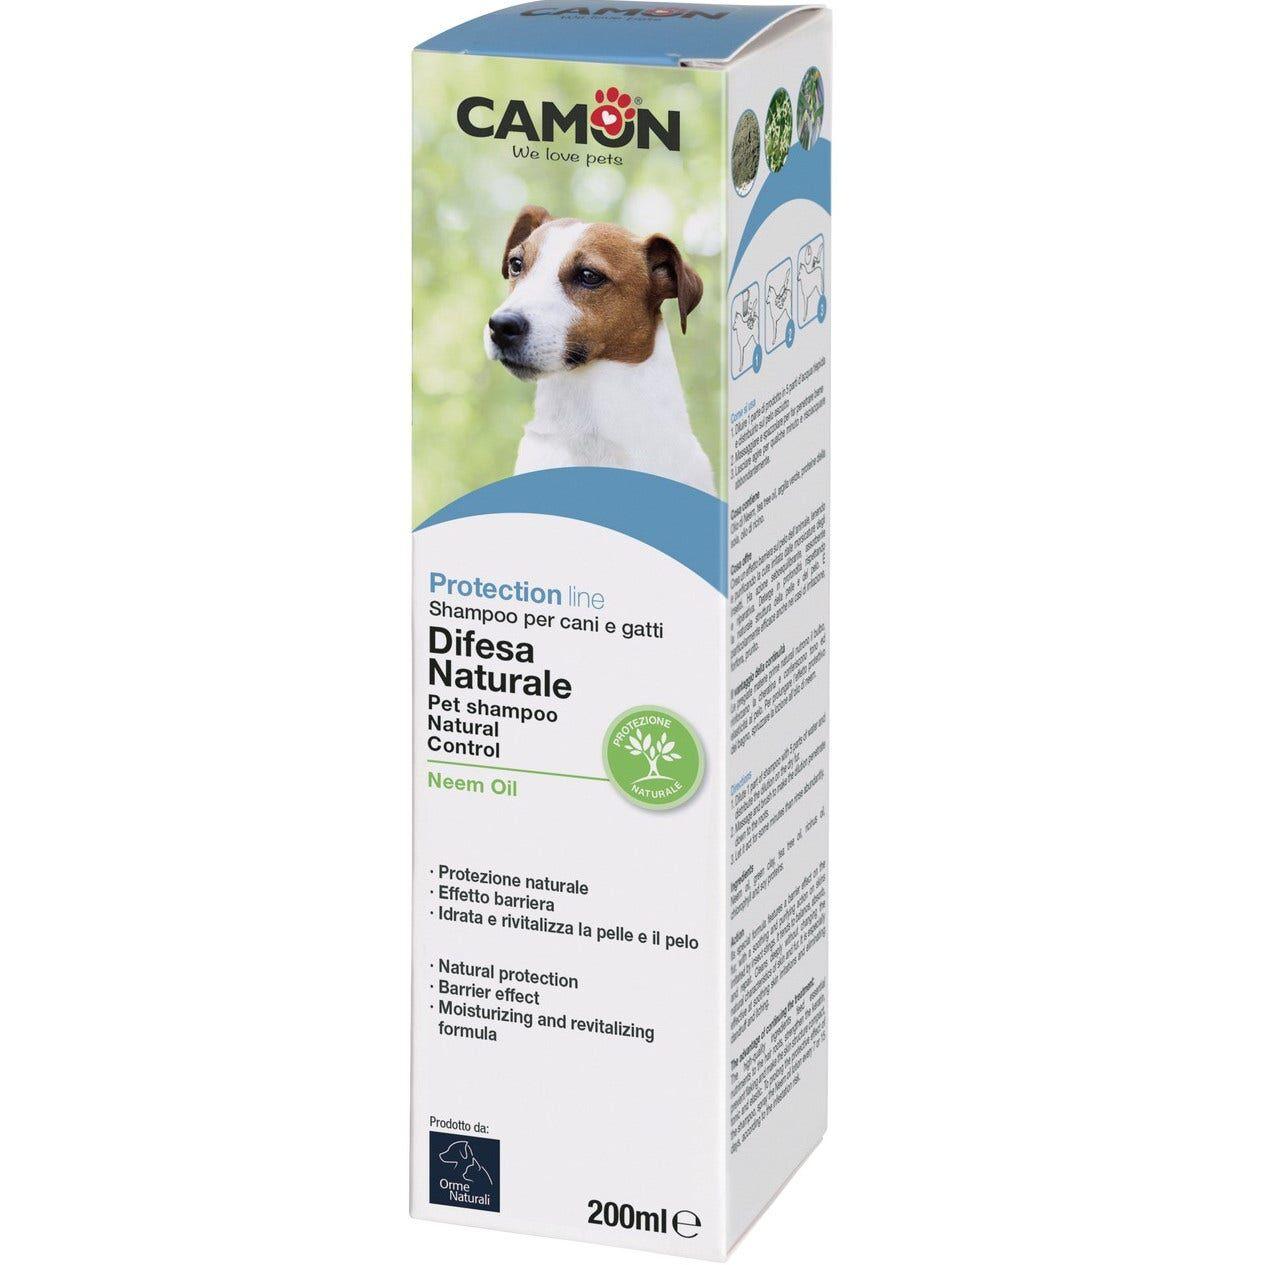 camon spa camon protection shampoo antiparassitario olio di neem cane 200ml